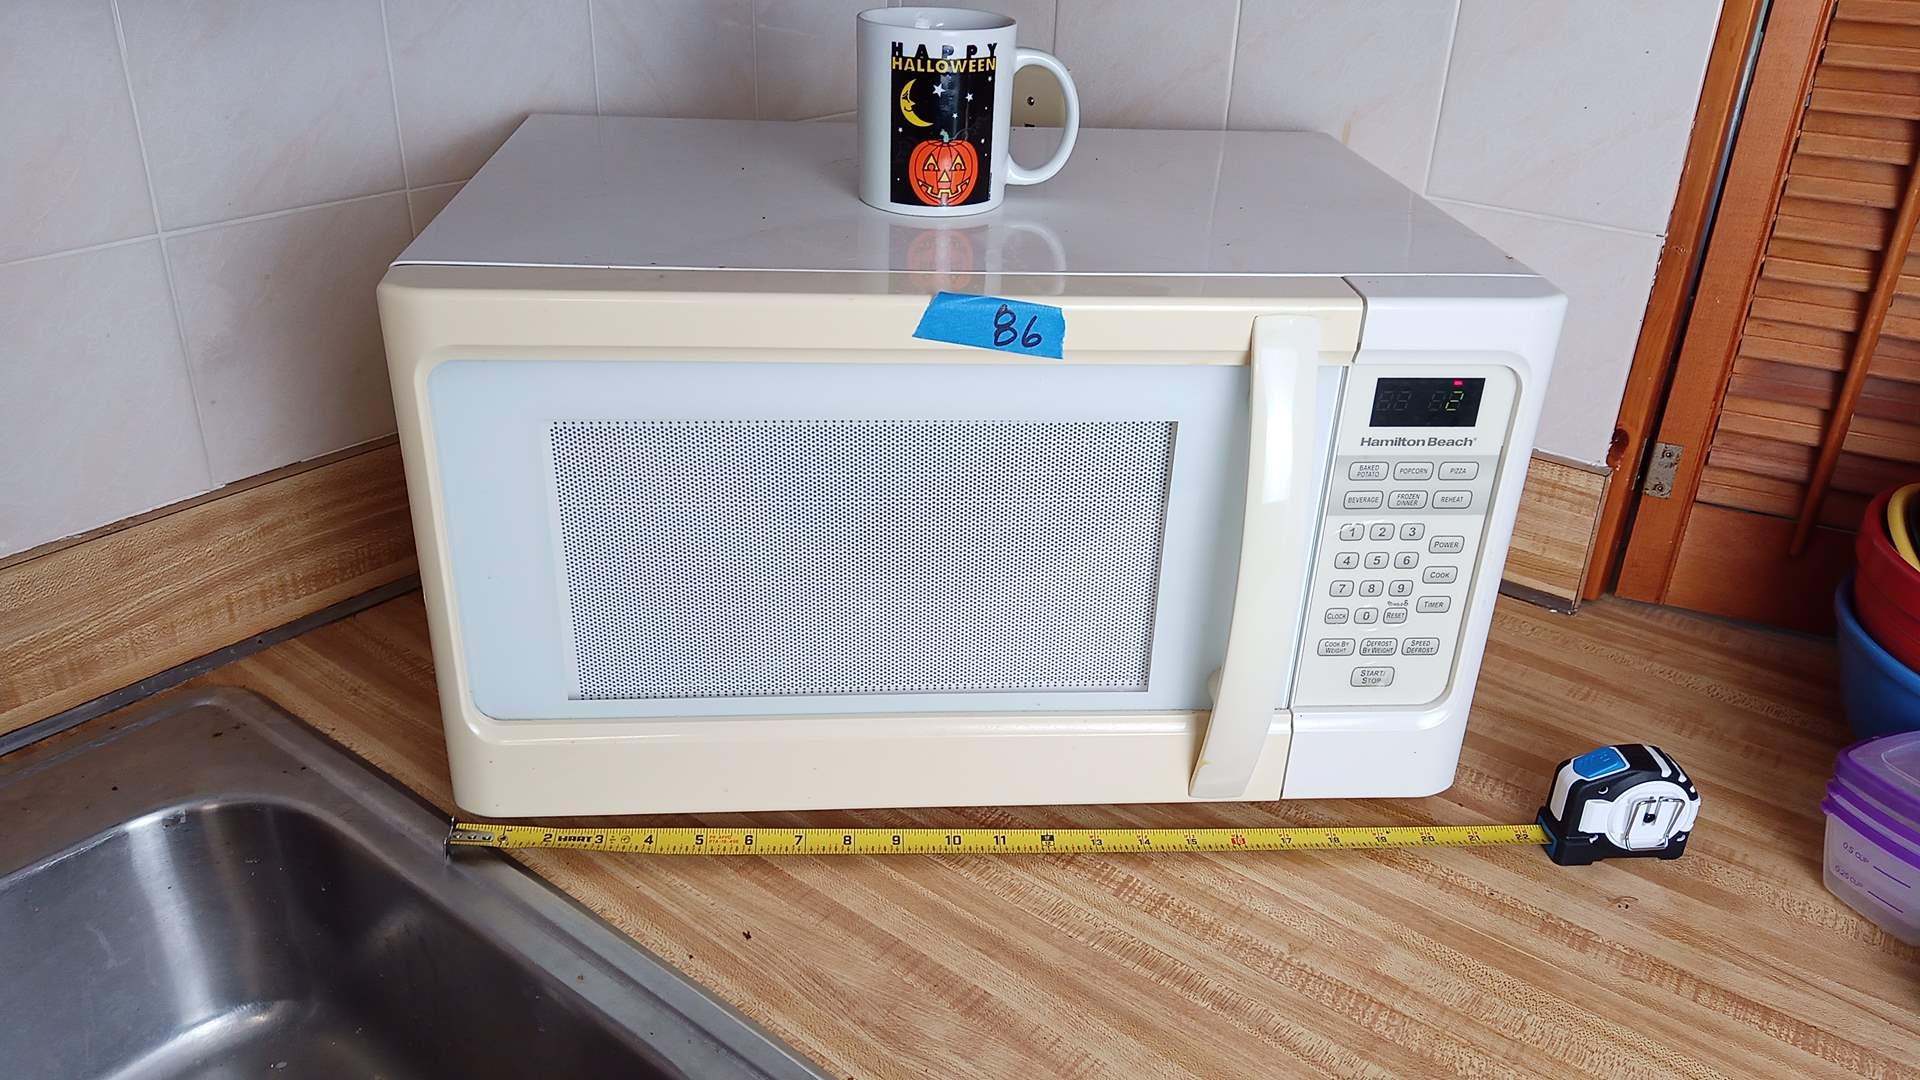 Lot # 86 Hamliton Beach 1000 watt MicroWave and Westhouse Toaster Oven